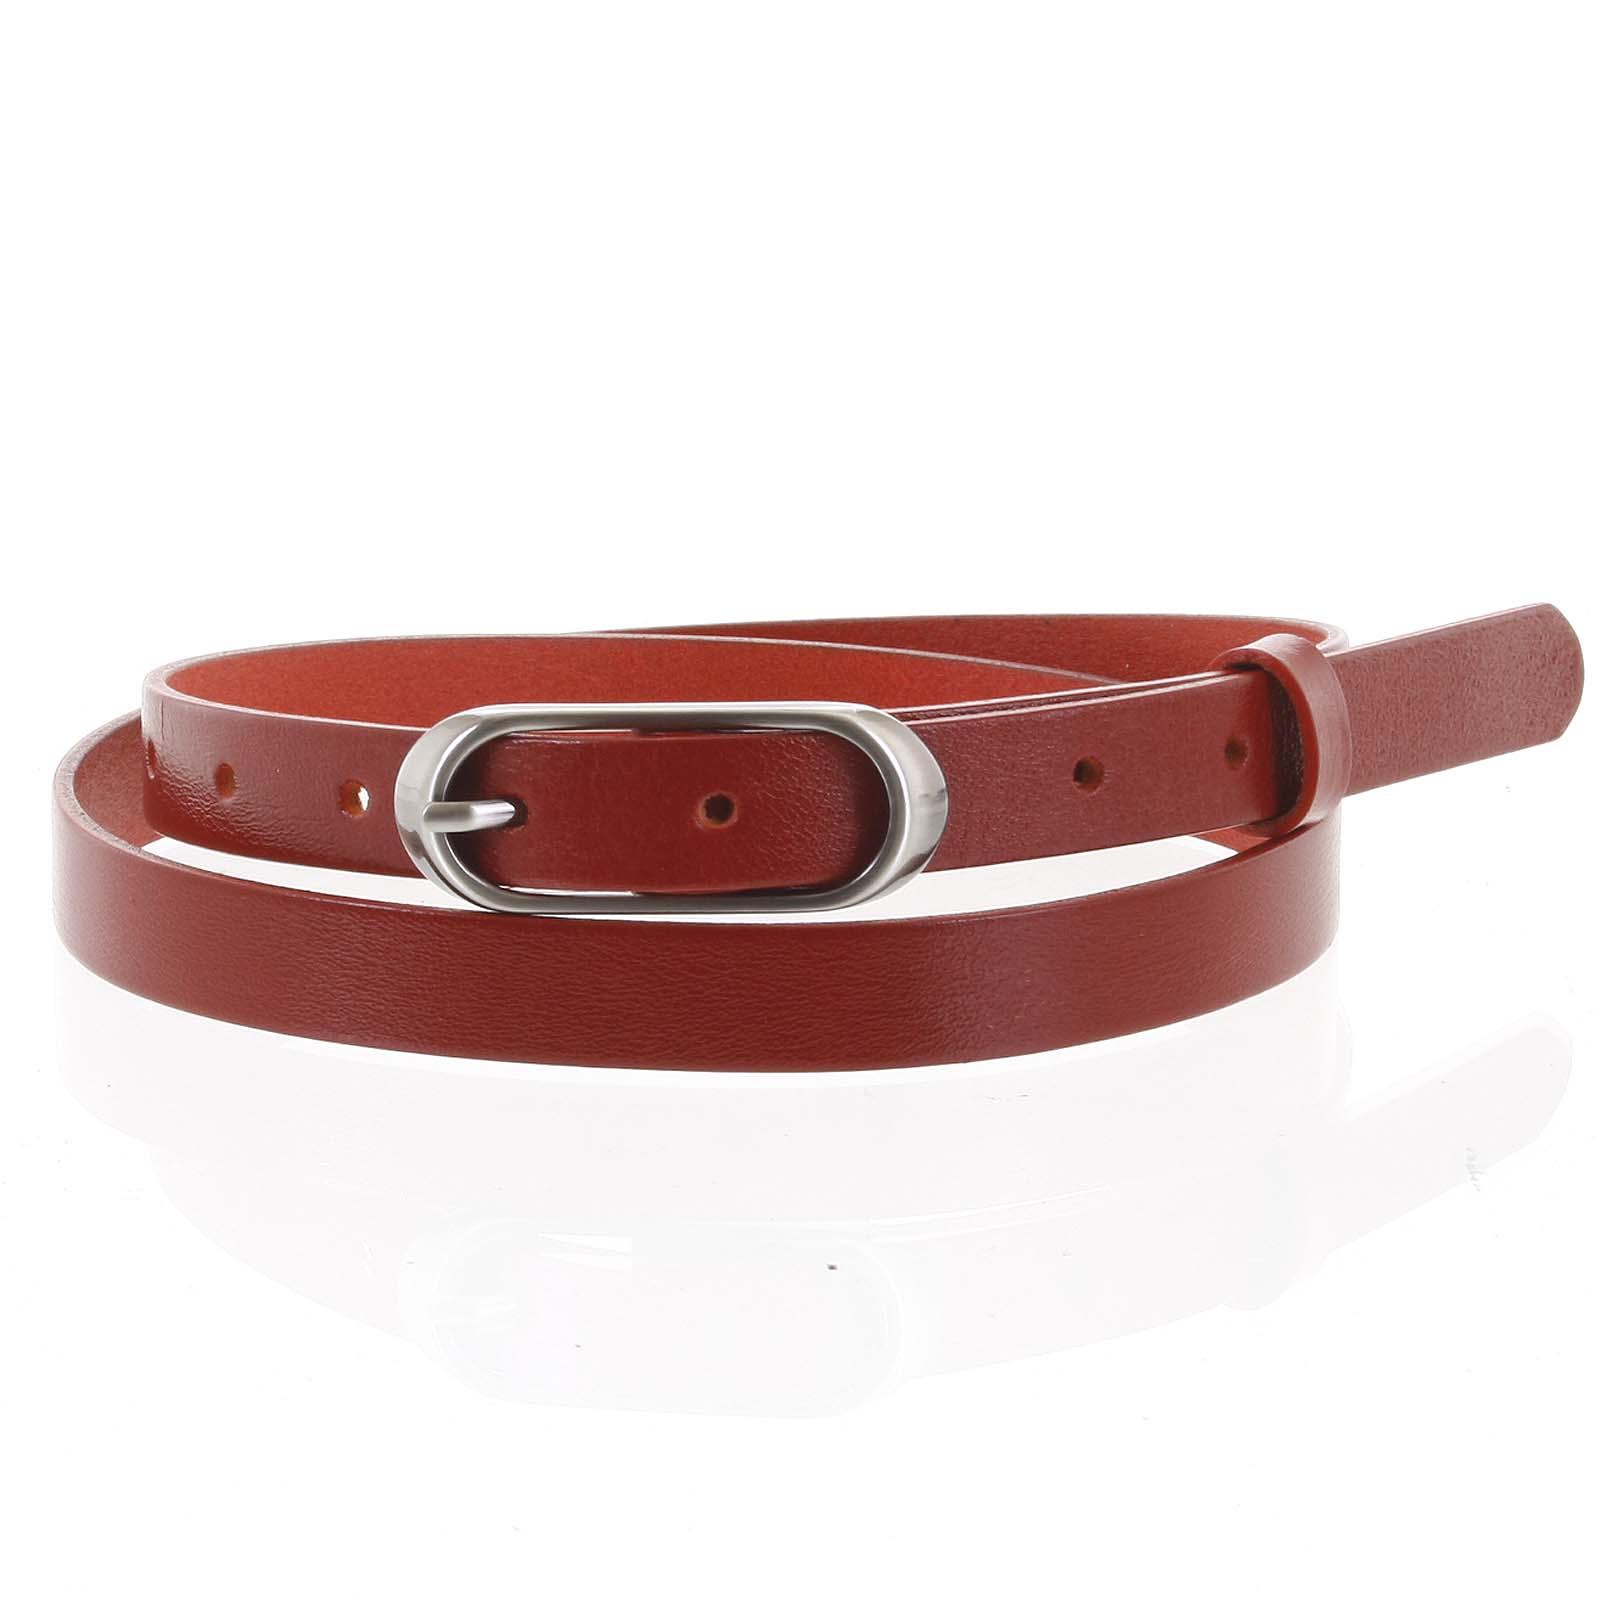 Dámsky kožený opasok červený - PB Cain 90 červená